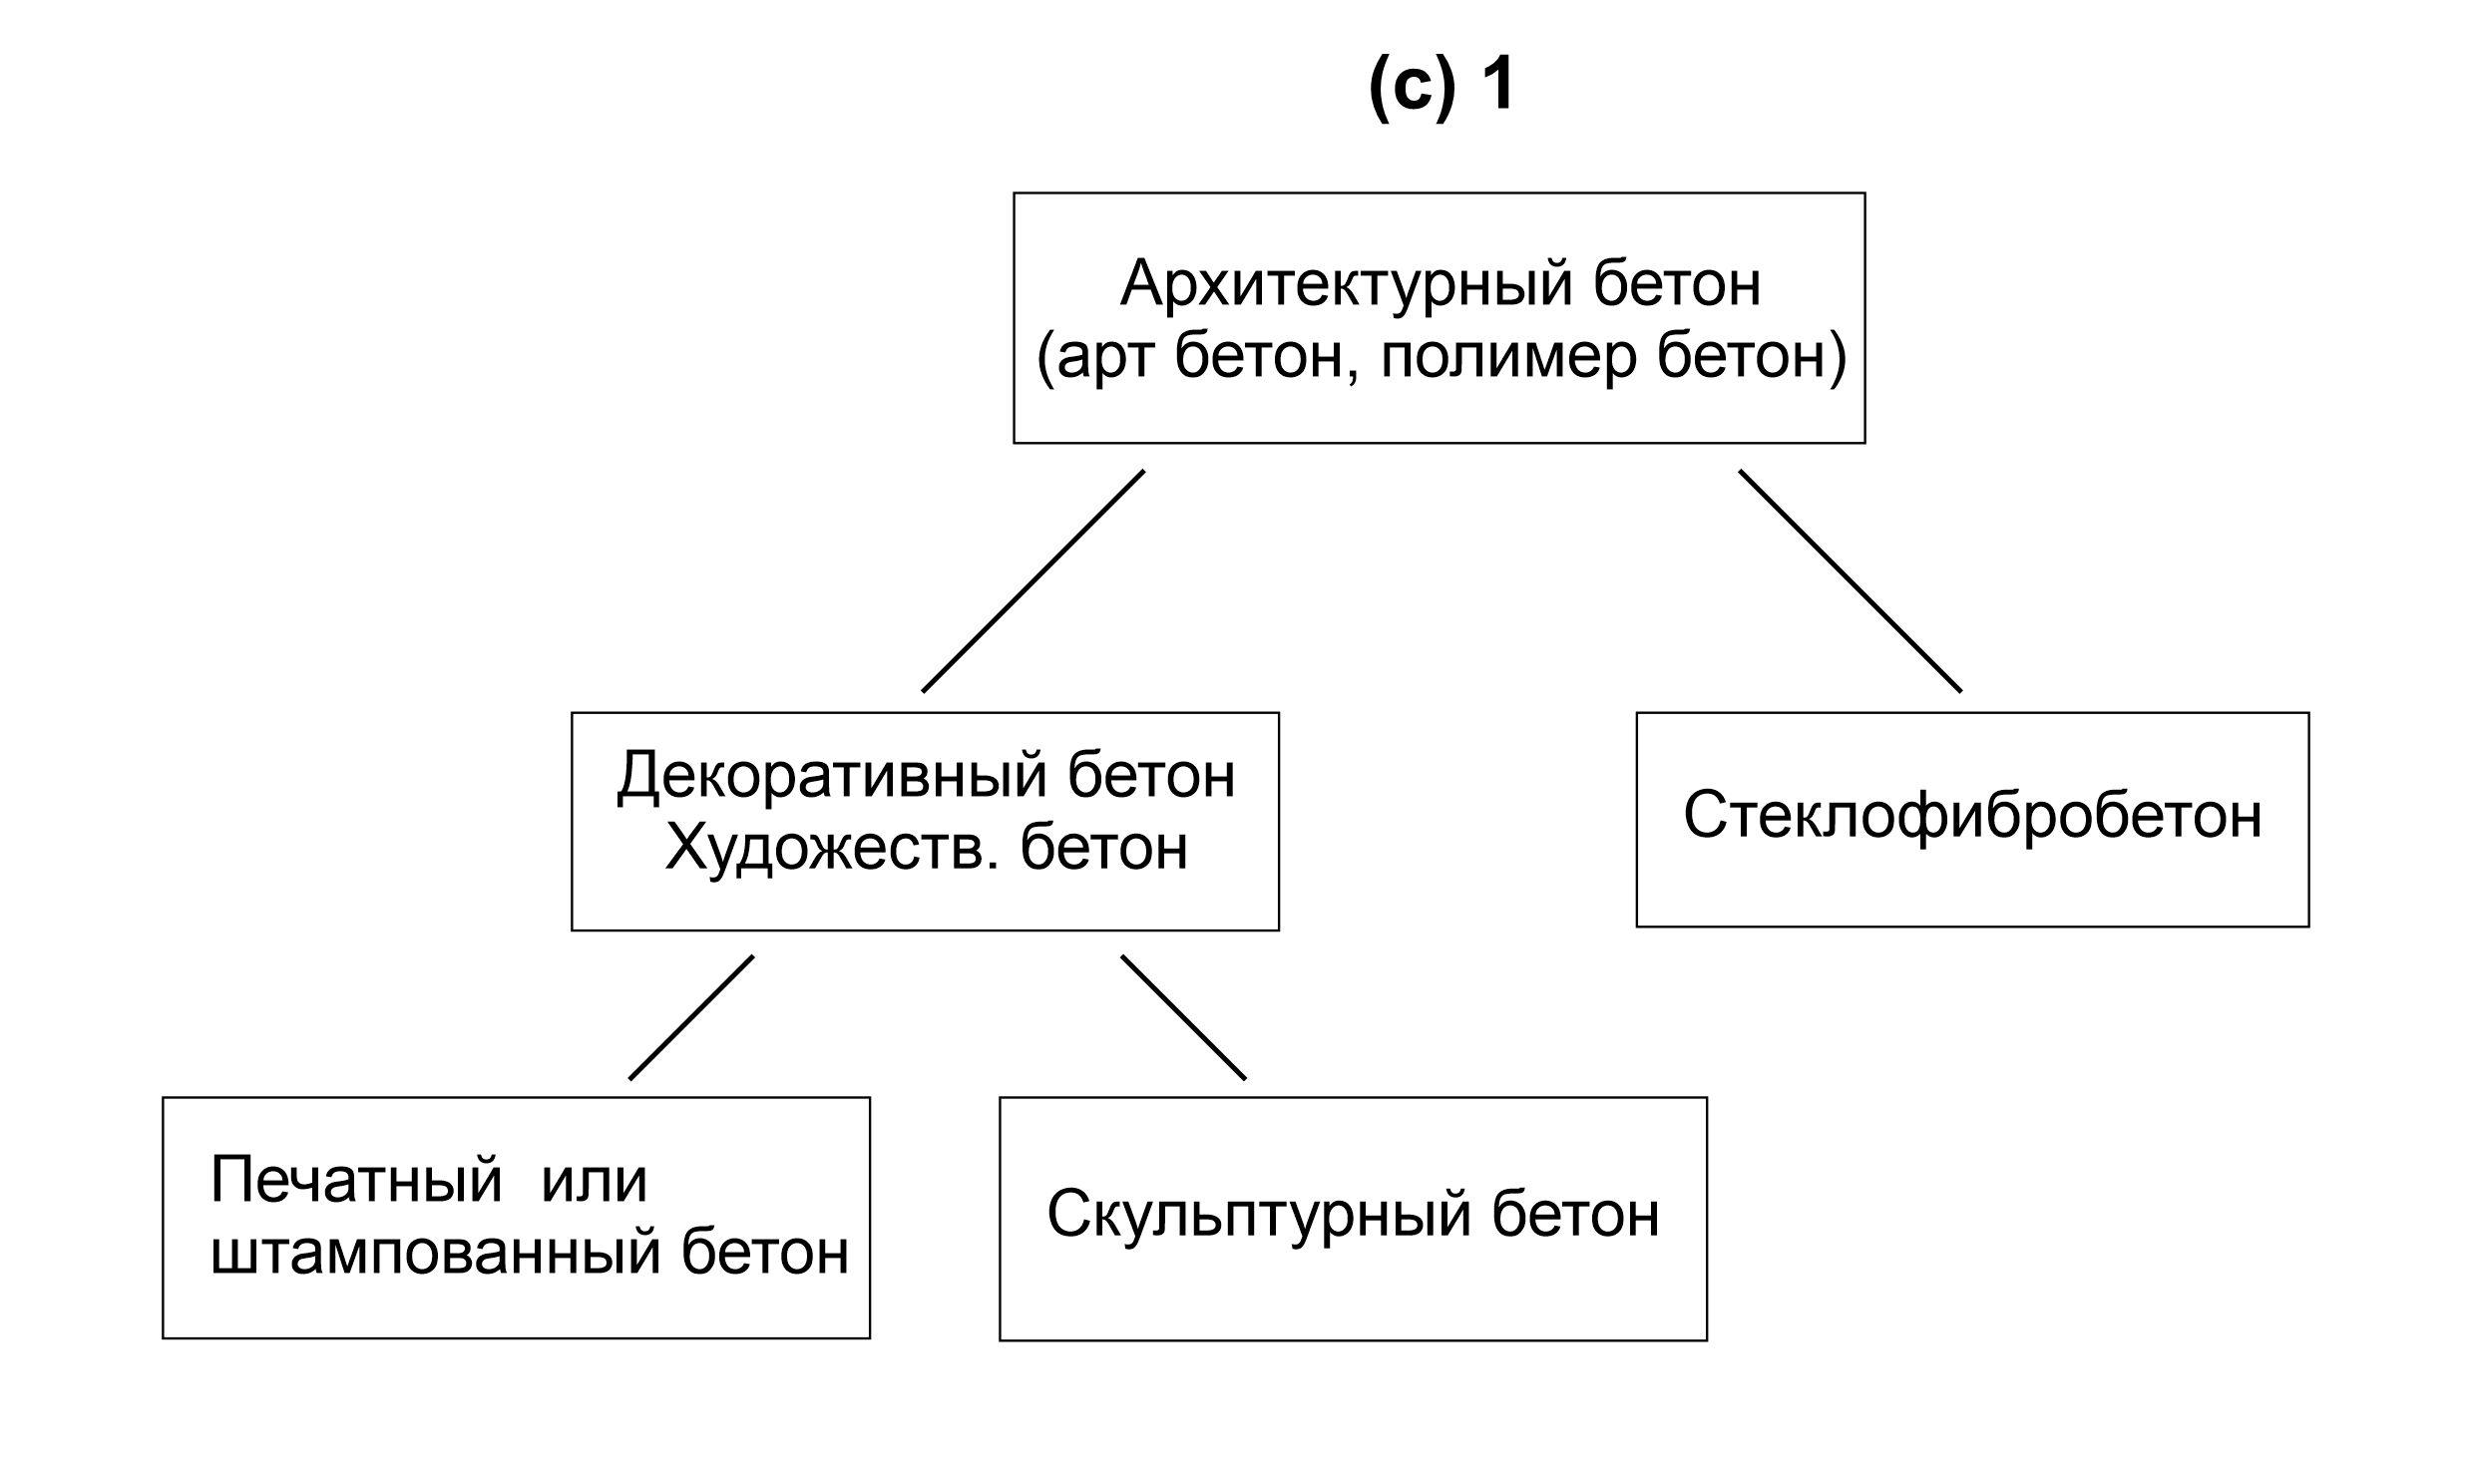 Классификация арзитектурного бетона